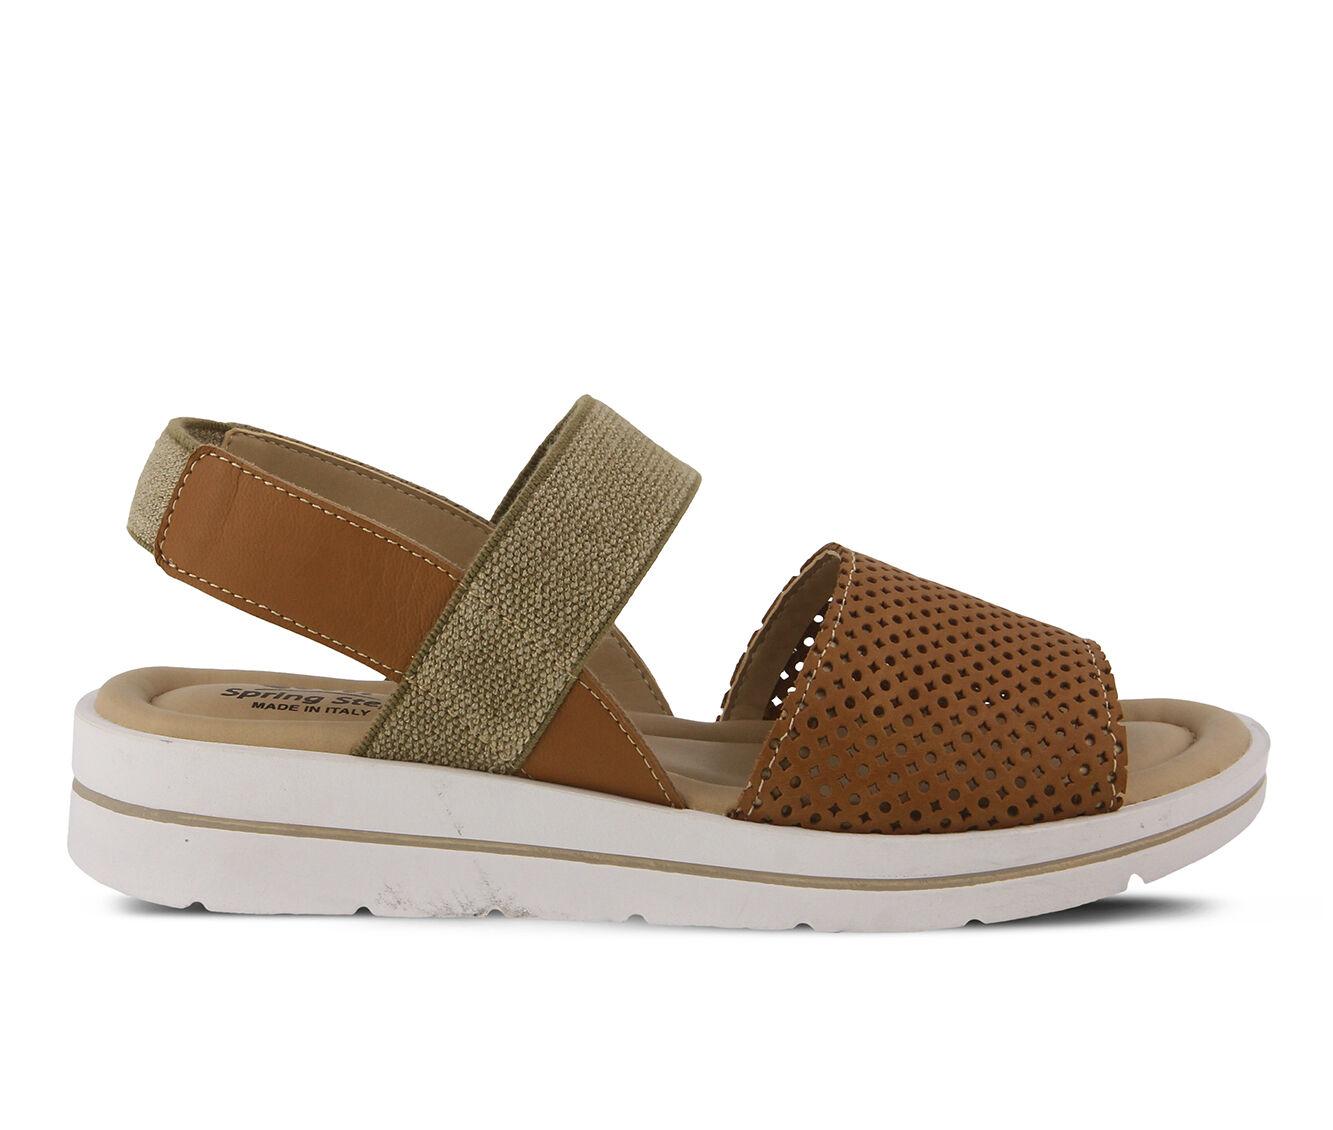 Women's SPRING STEP Travel Sandals Camel